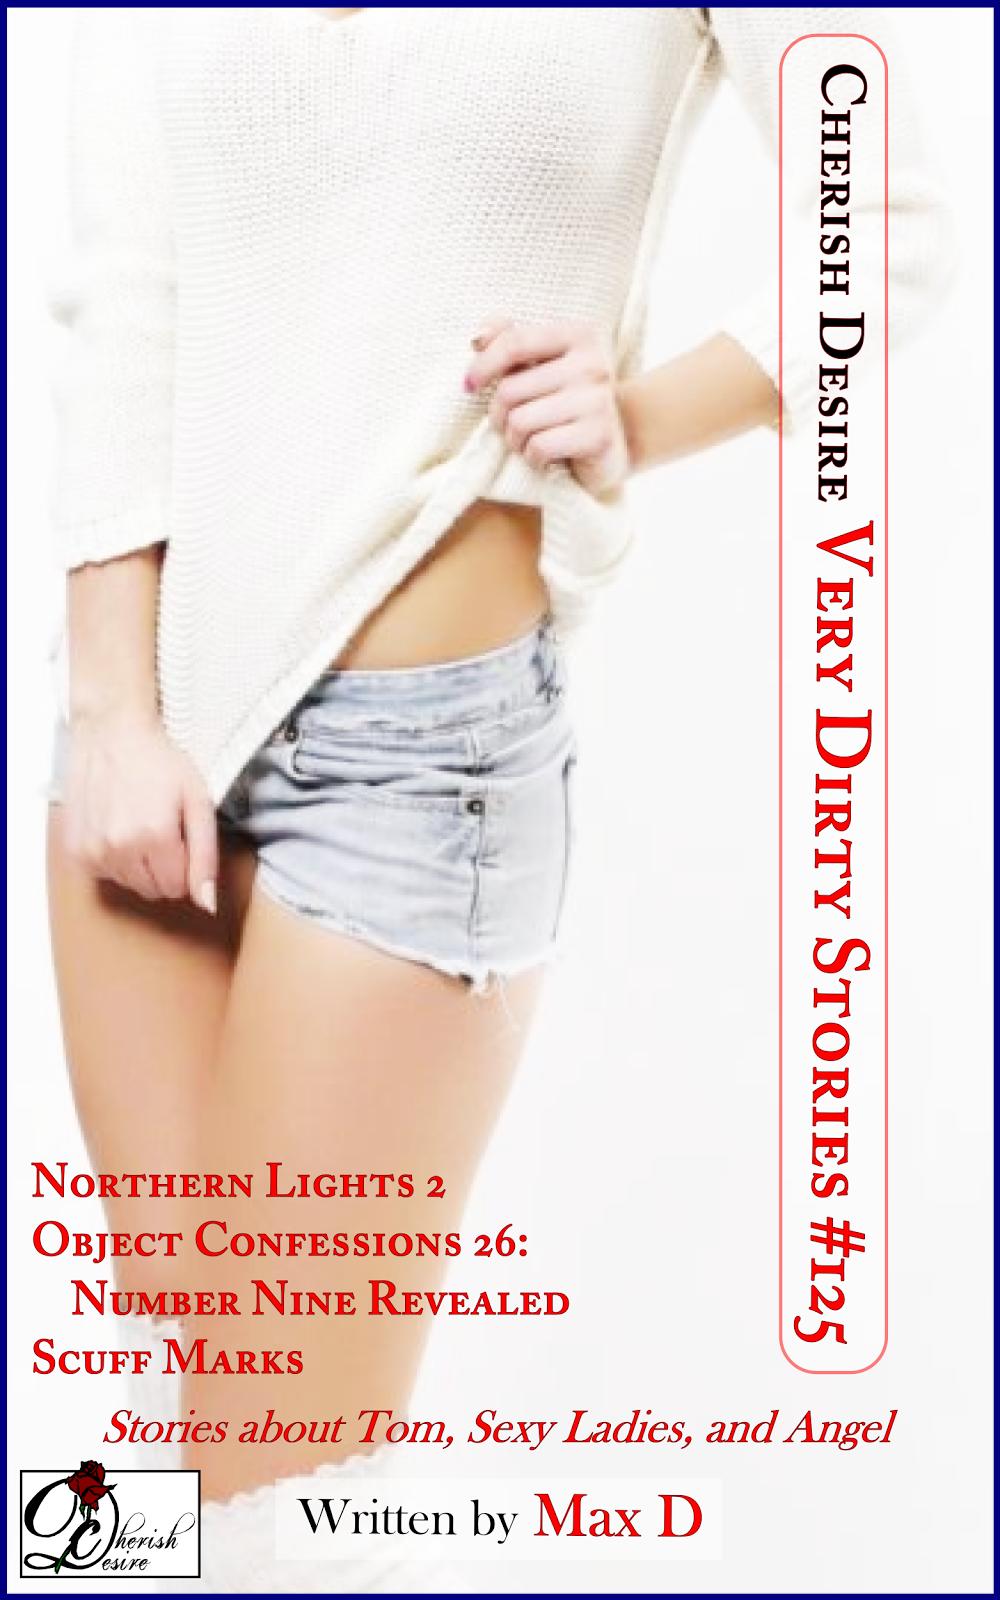 Cherish Desire: Very Dirty Stories #125, Max D, erotica